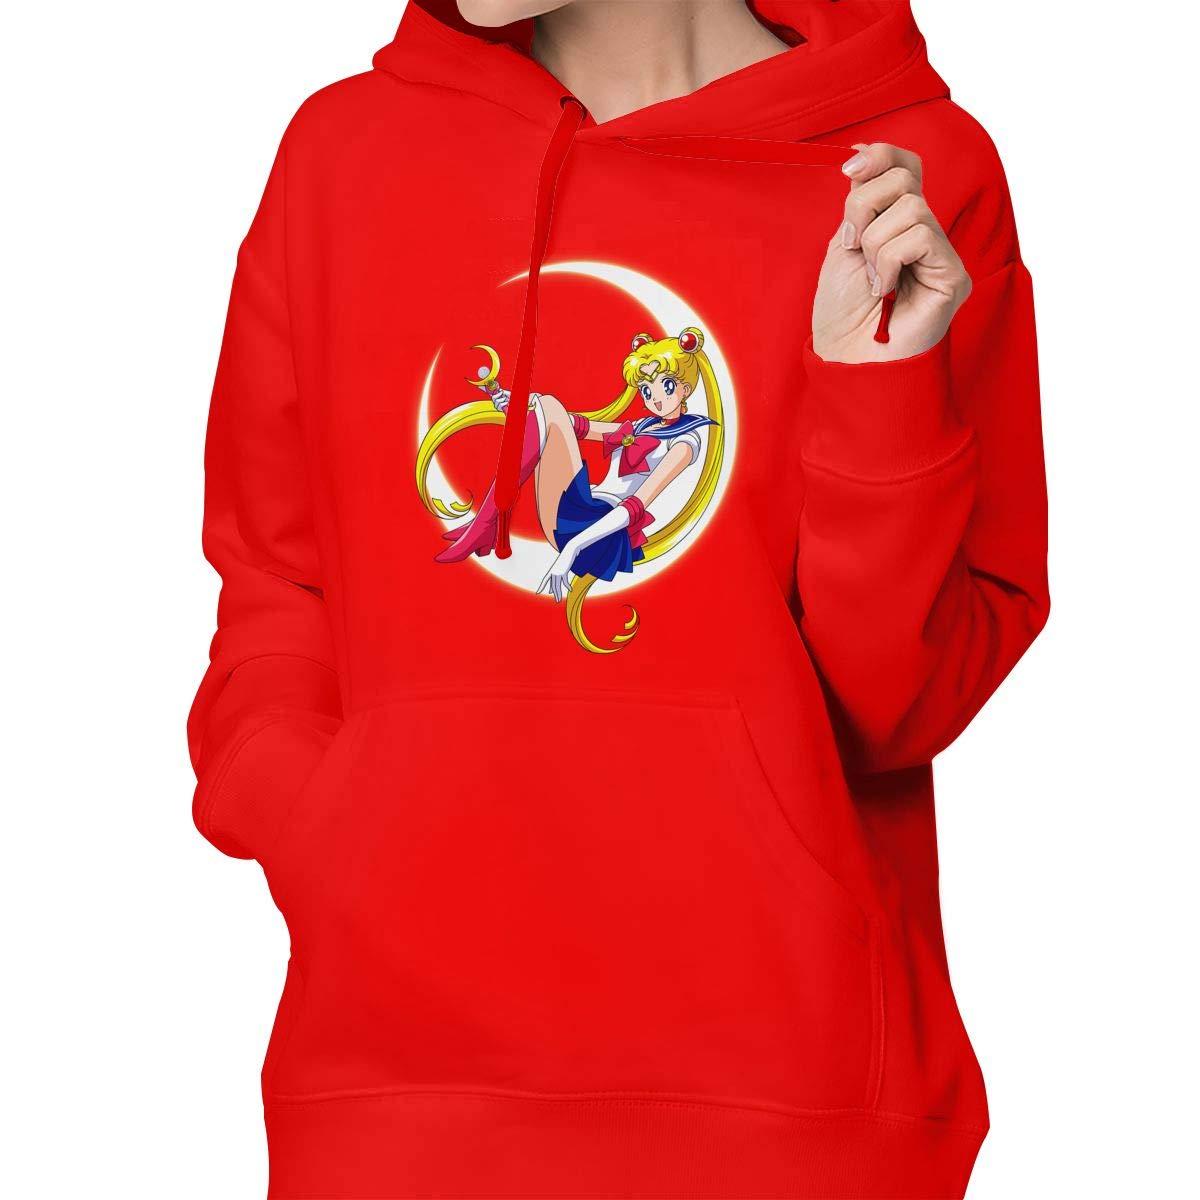 Hooded Sweatshirt Sailor Moon Chic Lady Pullover Hoodie BYUCI FMILOC